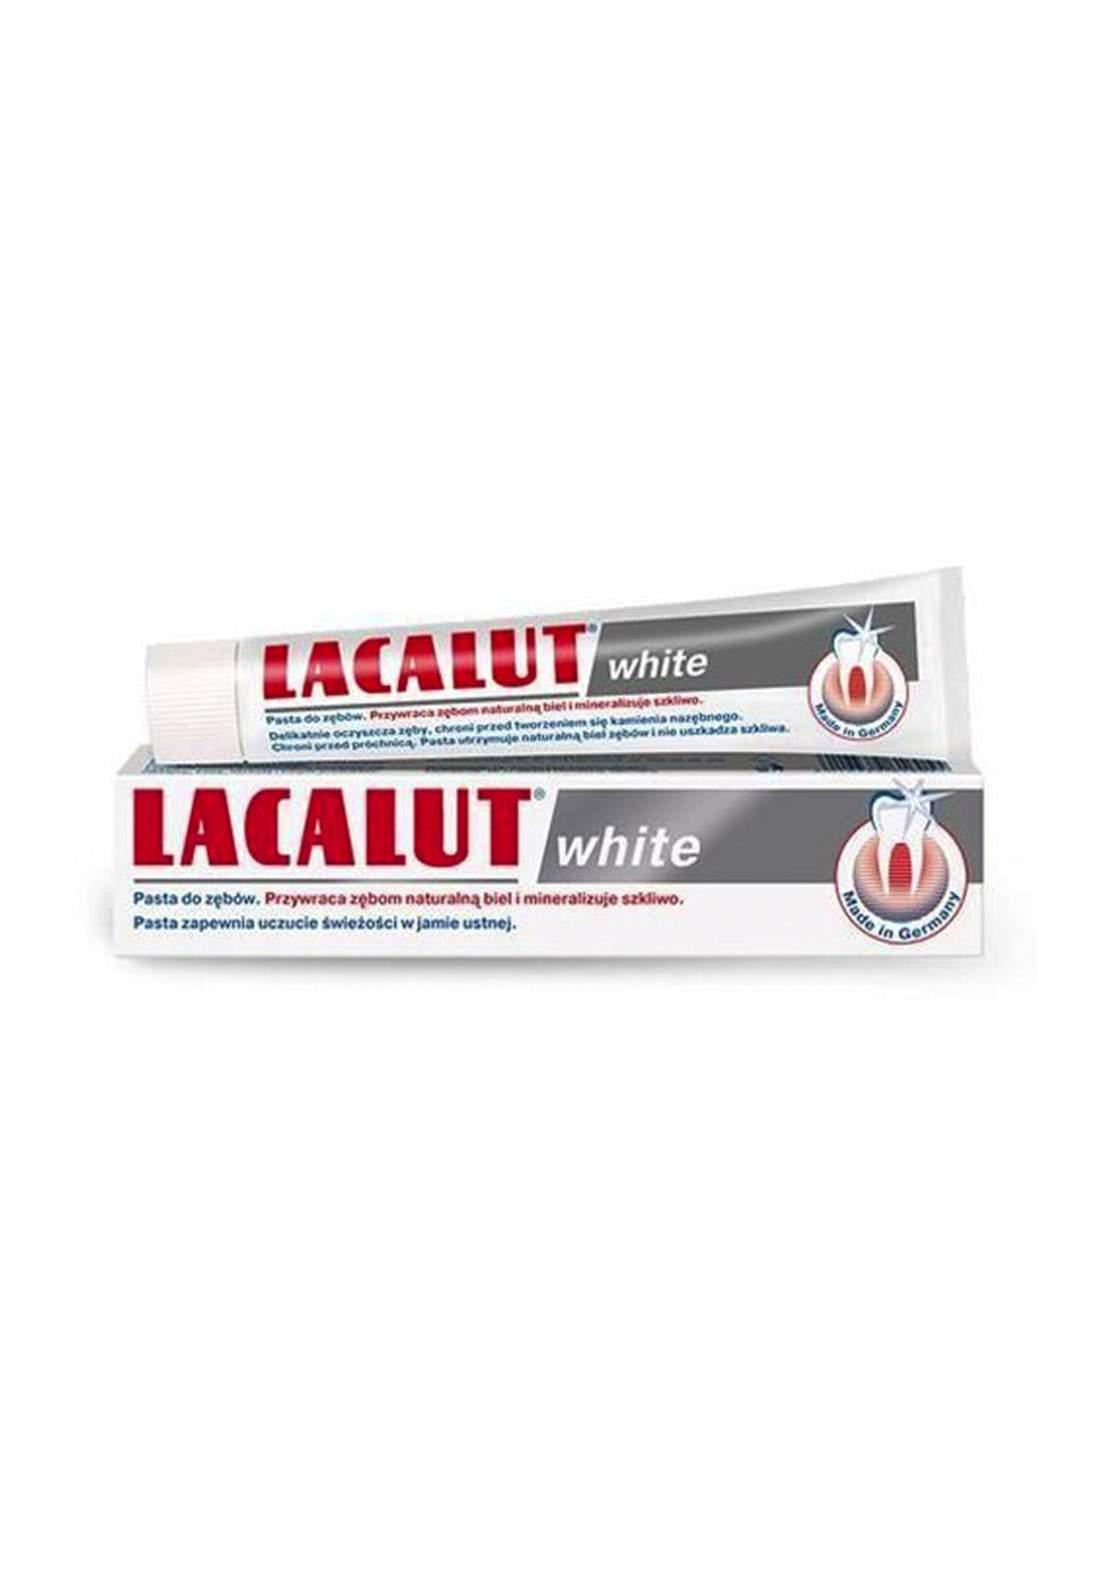 Lacalut White Toothpaste 75ml معجون الأسنان